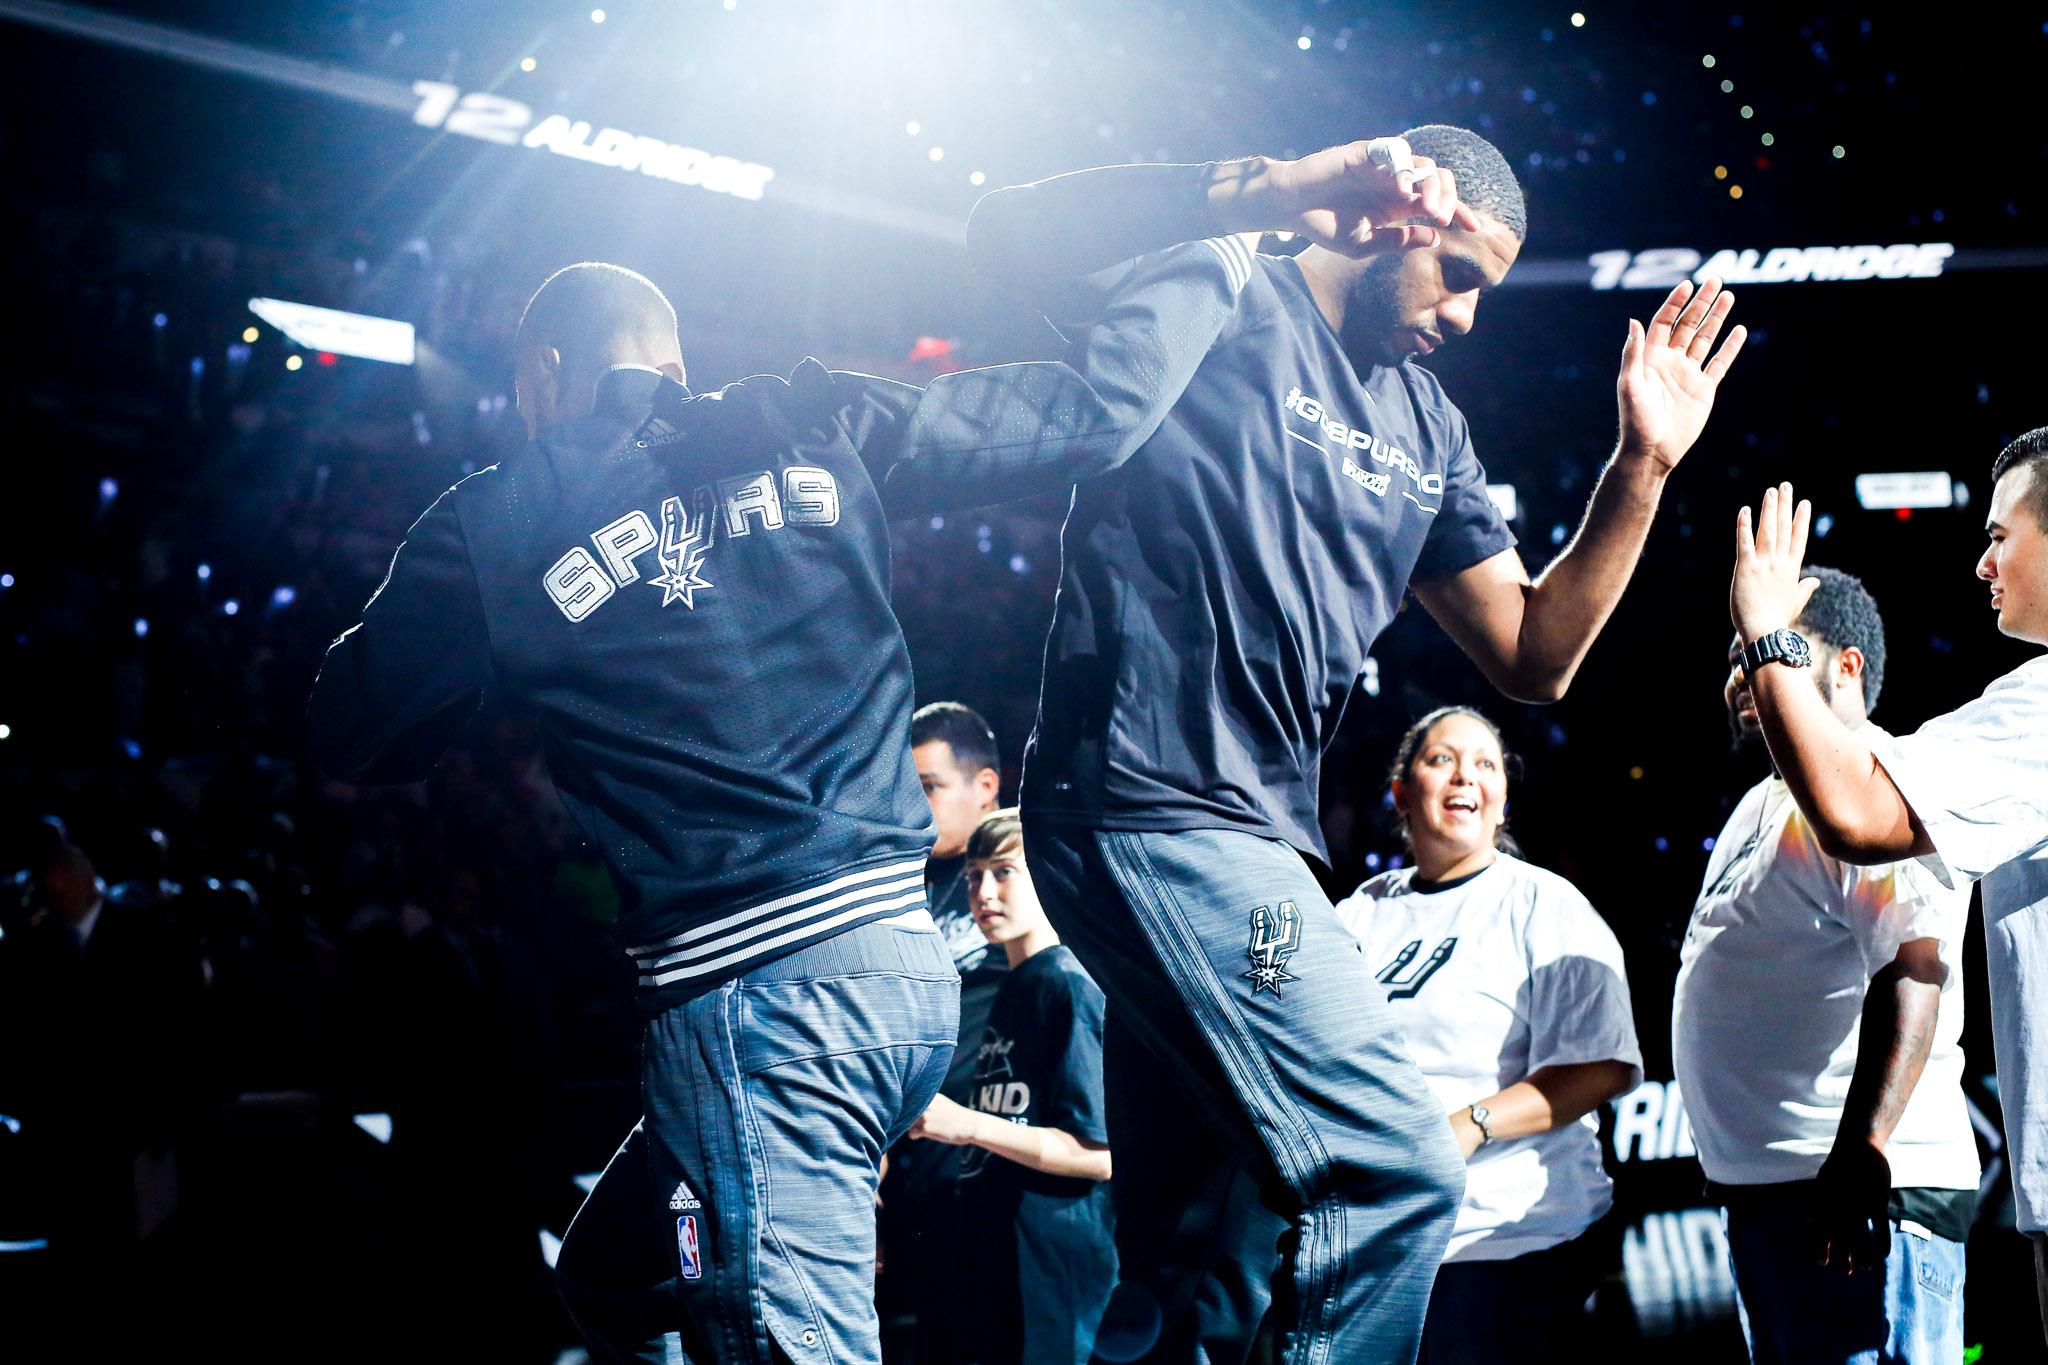 Spurs Forward #12 LaMarcus Aldridge walks through his teammates as he is introduced. Photo by Scott Ball.